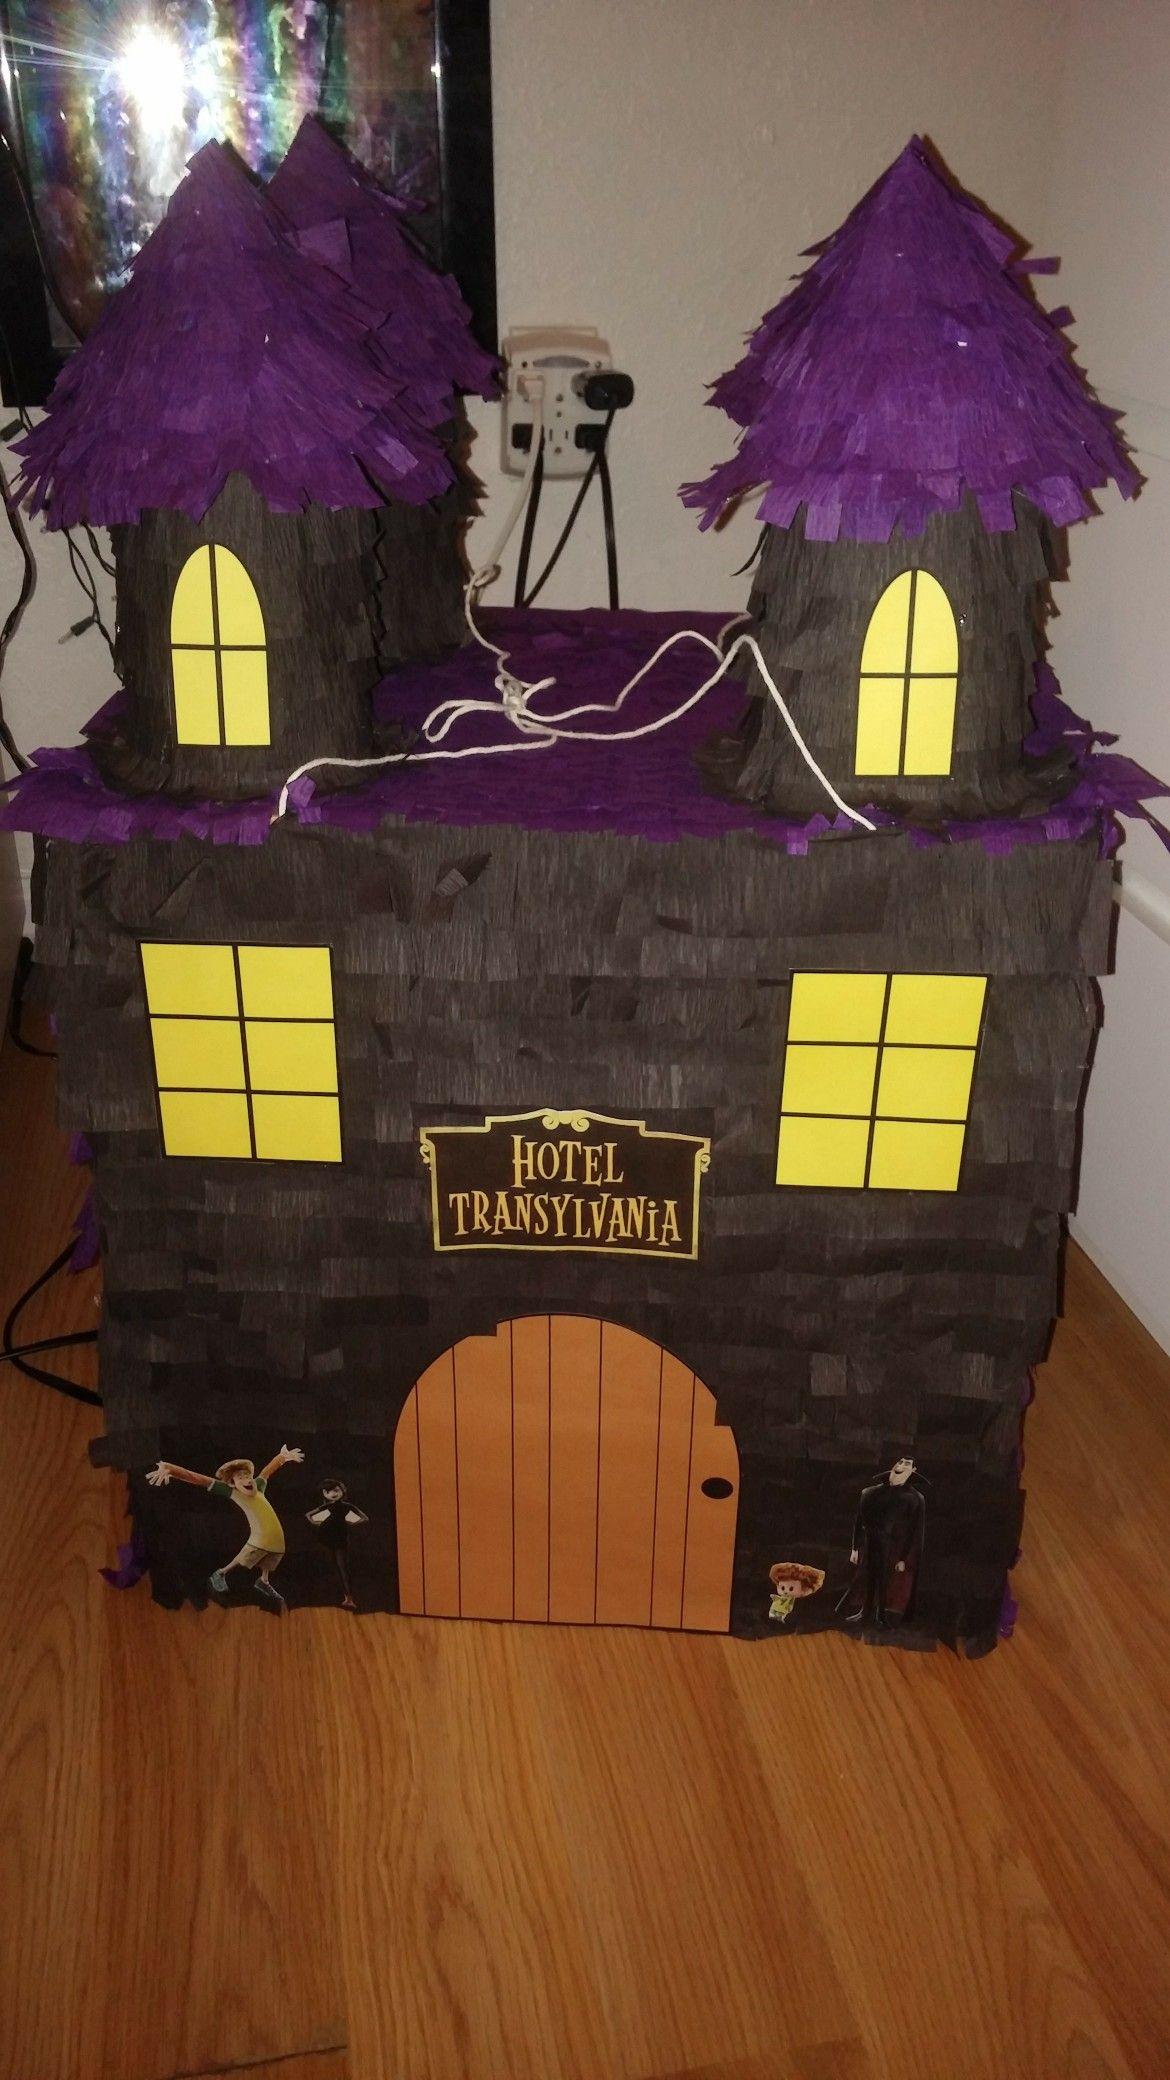 Hotel Transylvania Pinata Cardboard Boxes Crepe